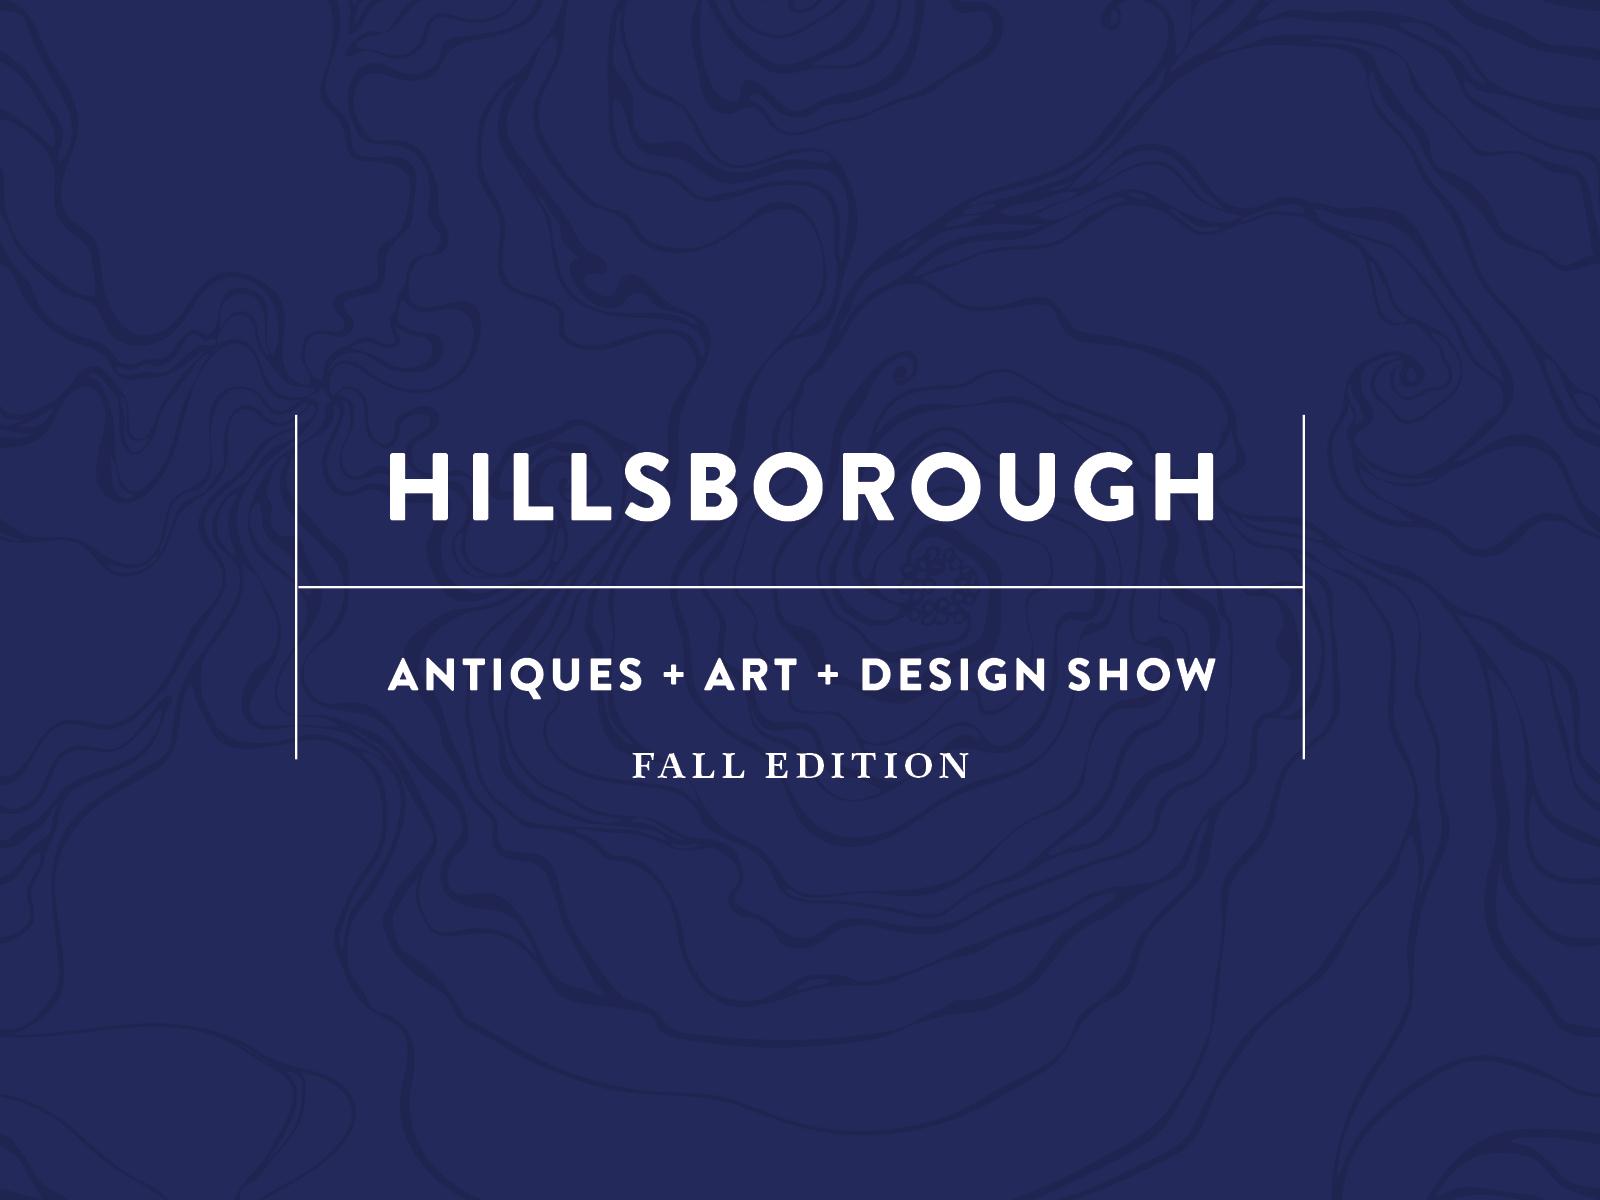 Hillsborough Antiques + Art + Design Show: Fall Edition